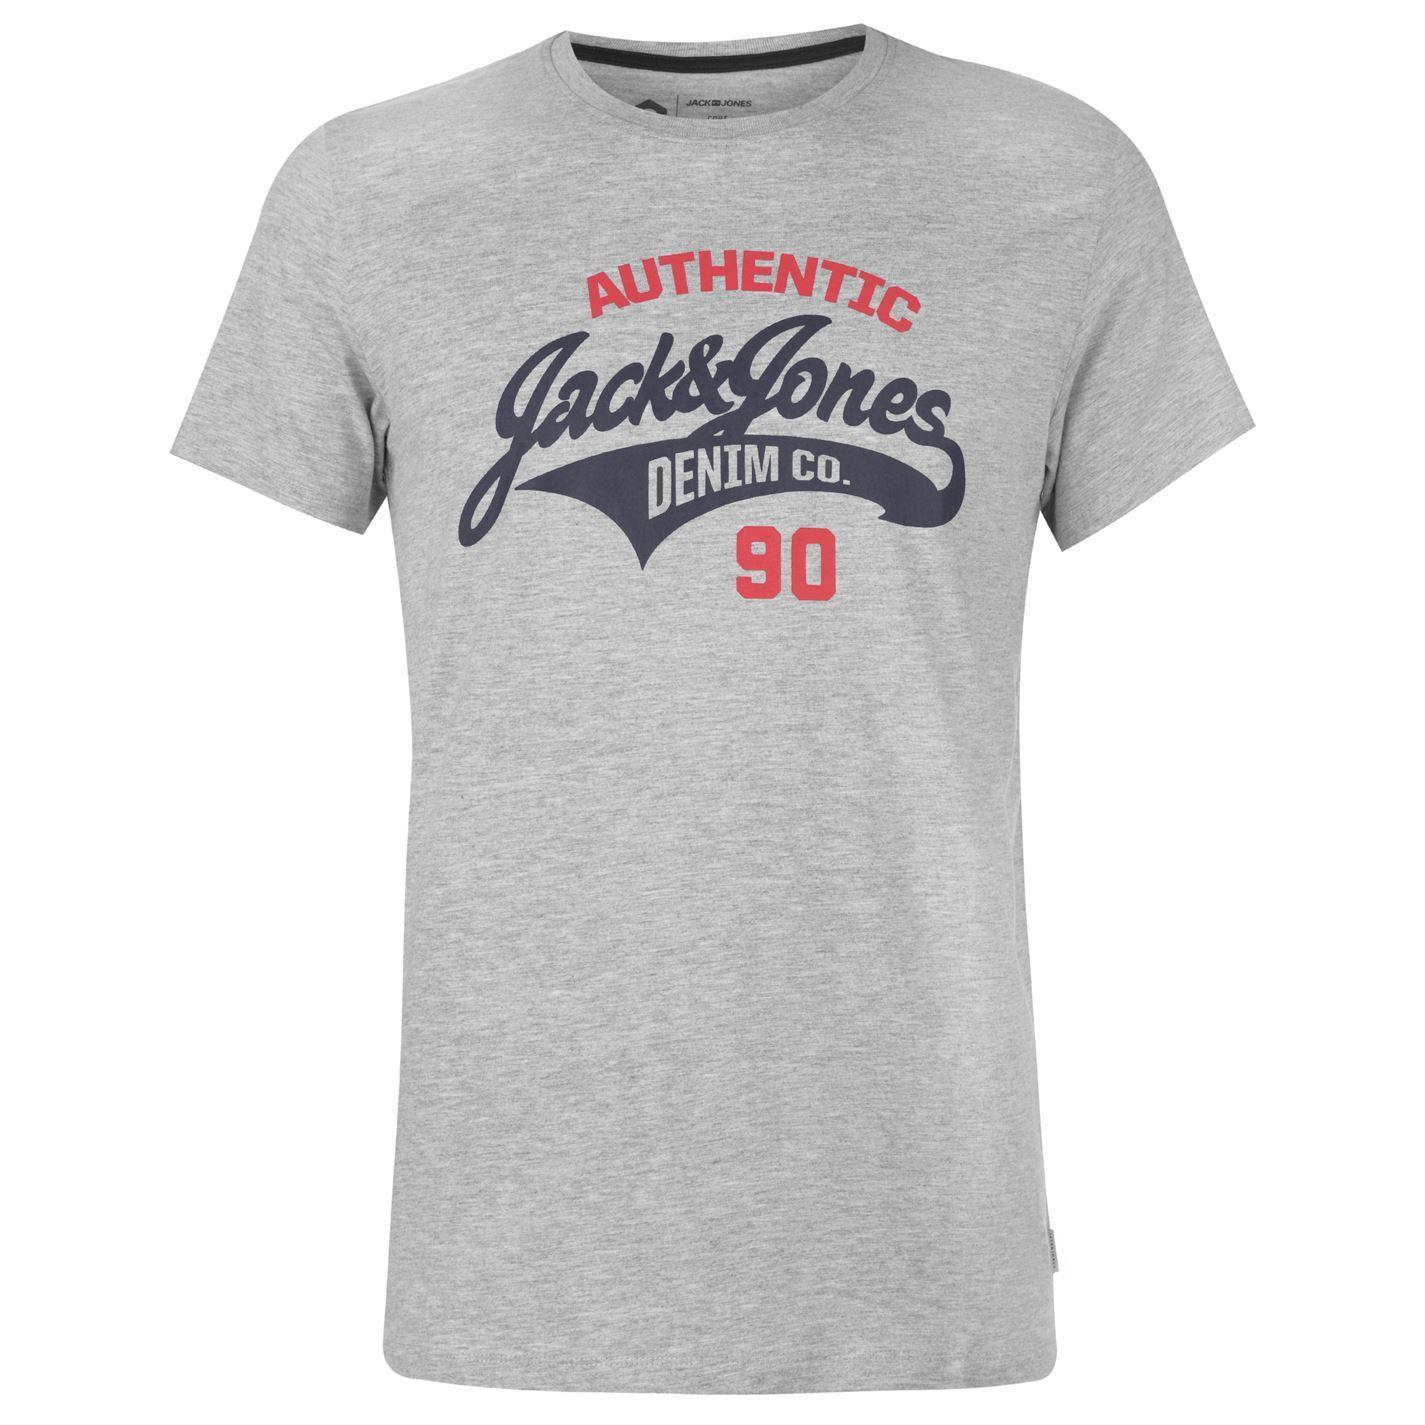 Jack-and-Jones-Core-Heritage-Logo-T-Shirt-Mens-Tee-Shirt-Top thumbnail 6